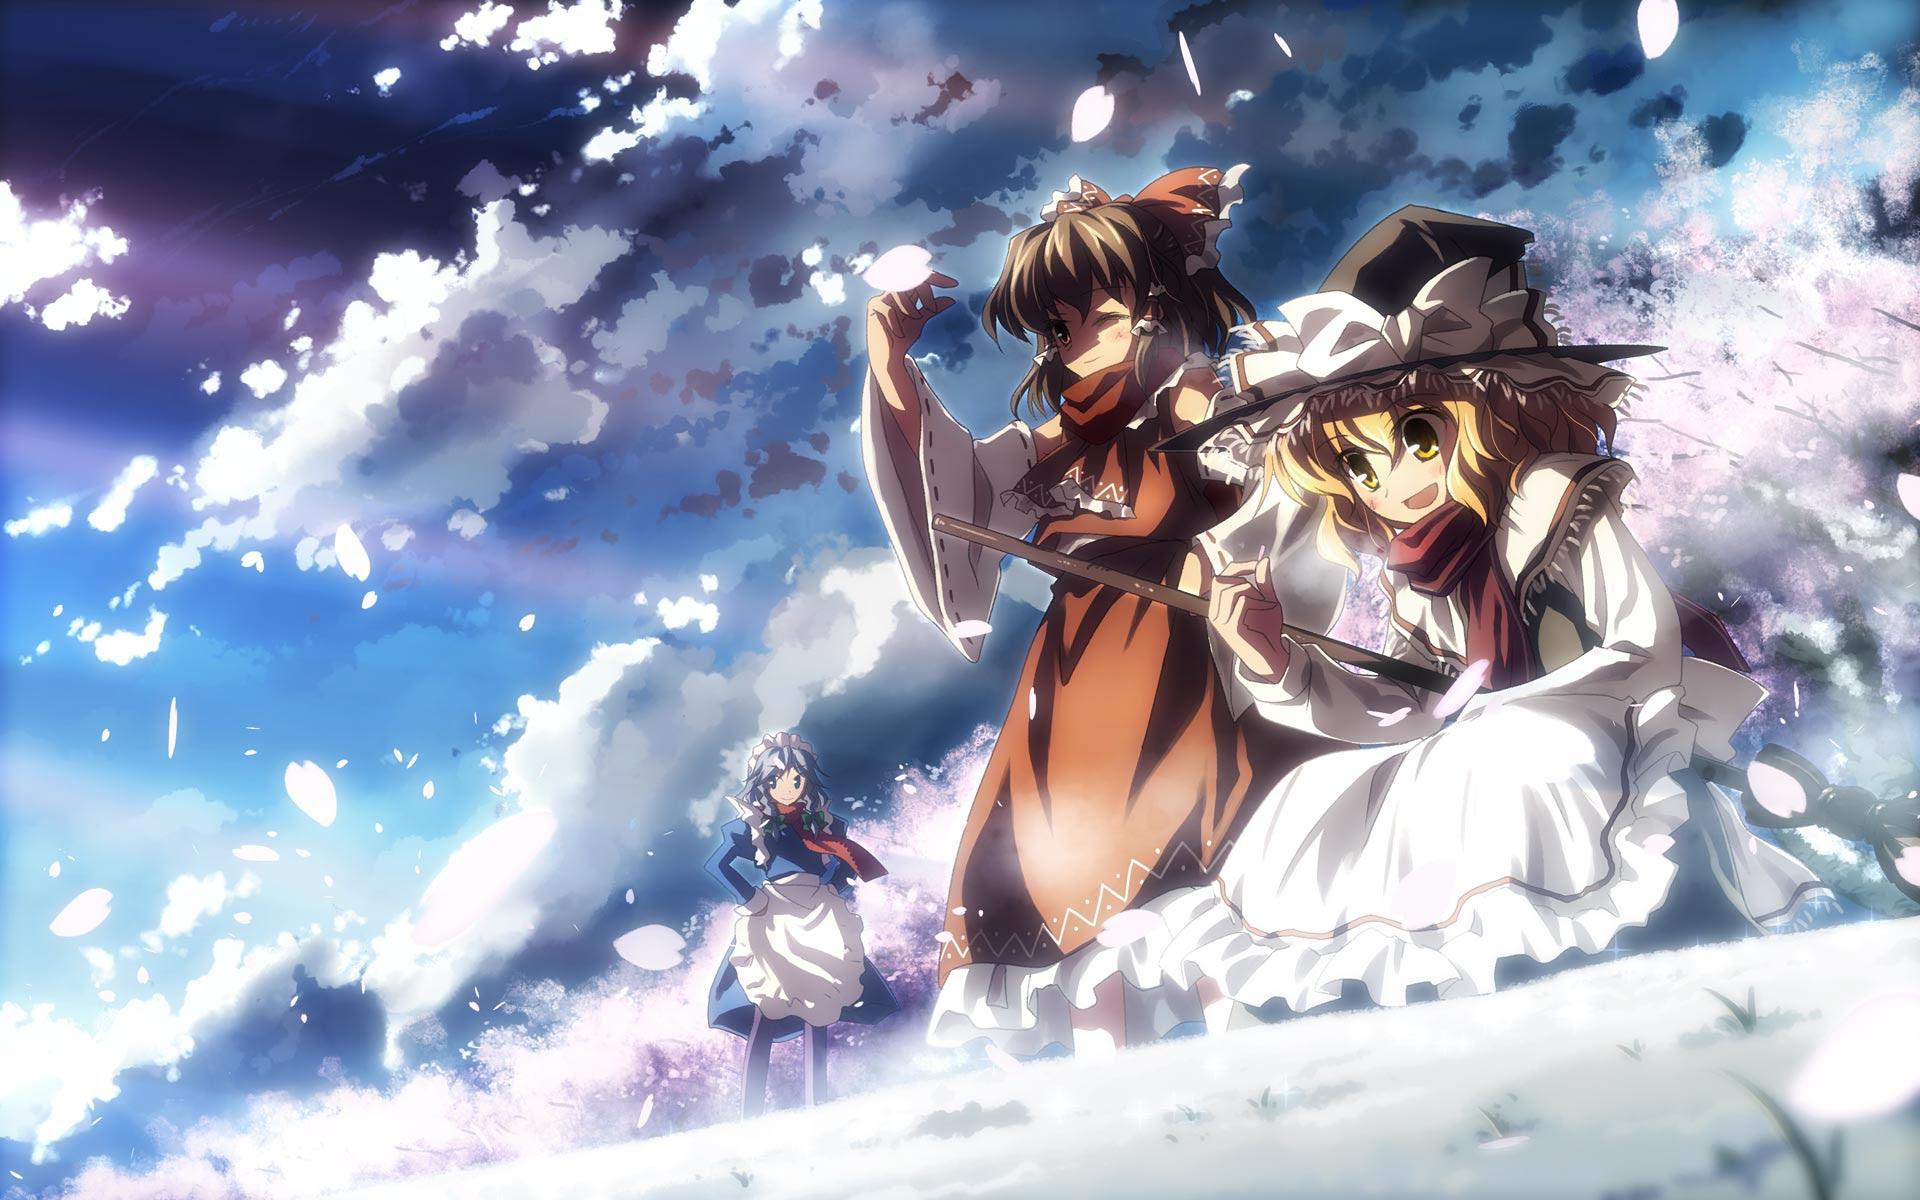 Touhou Higher Resolution Wallpaper Touhou Topics Anime Wallpapers